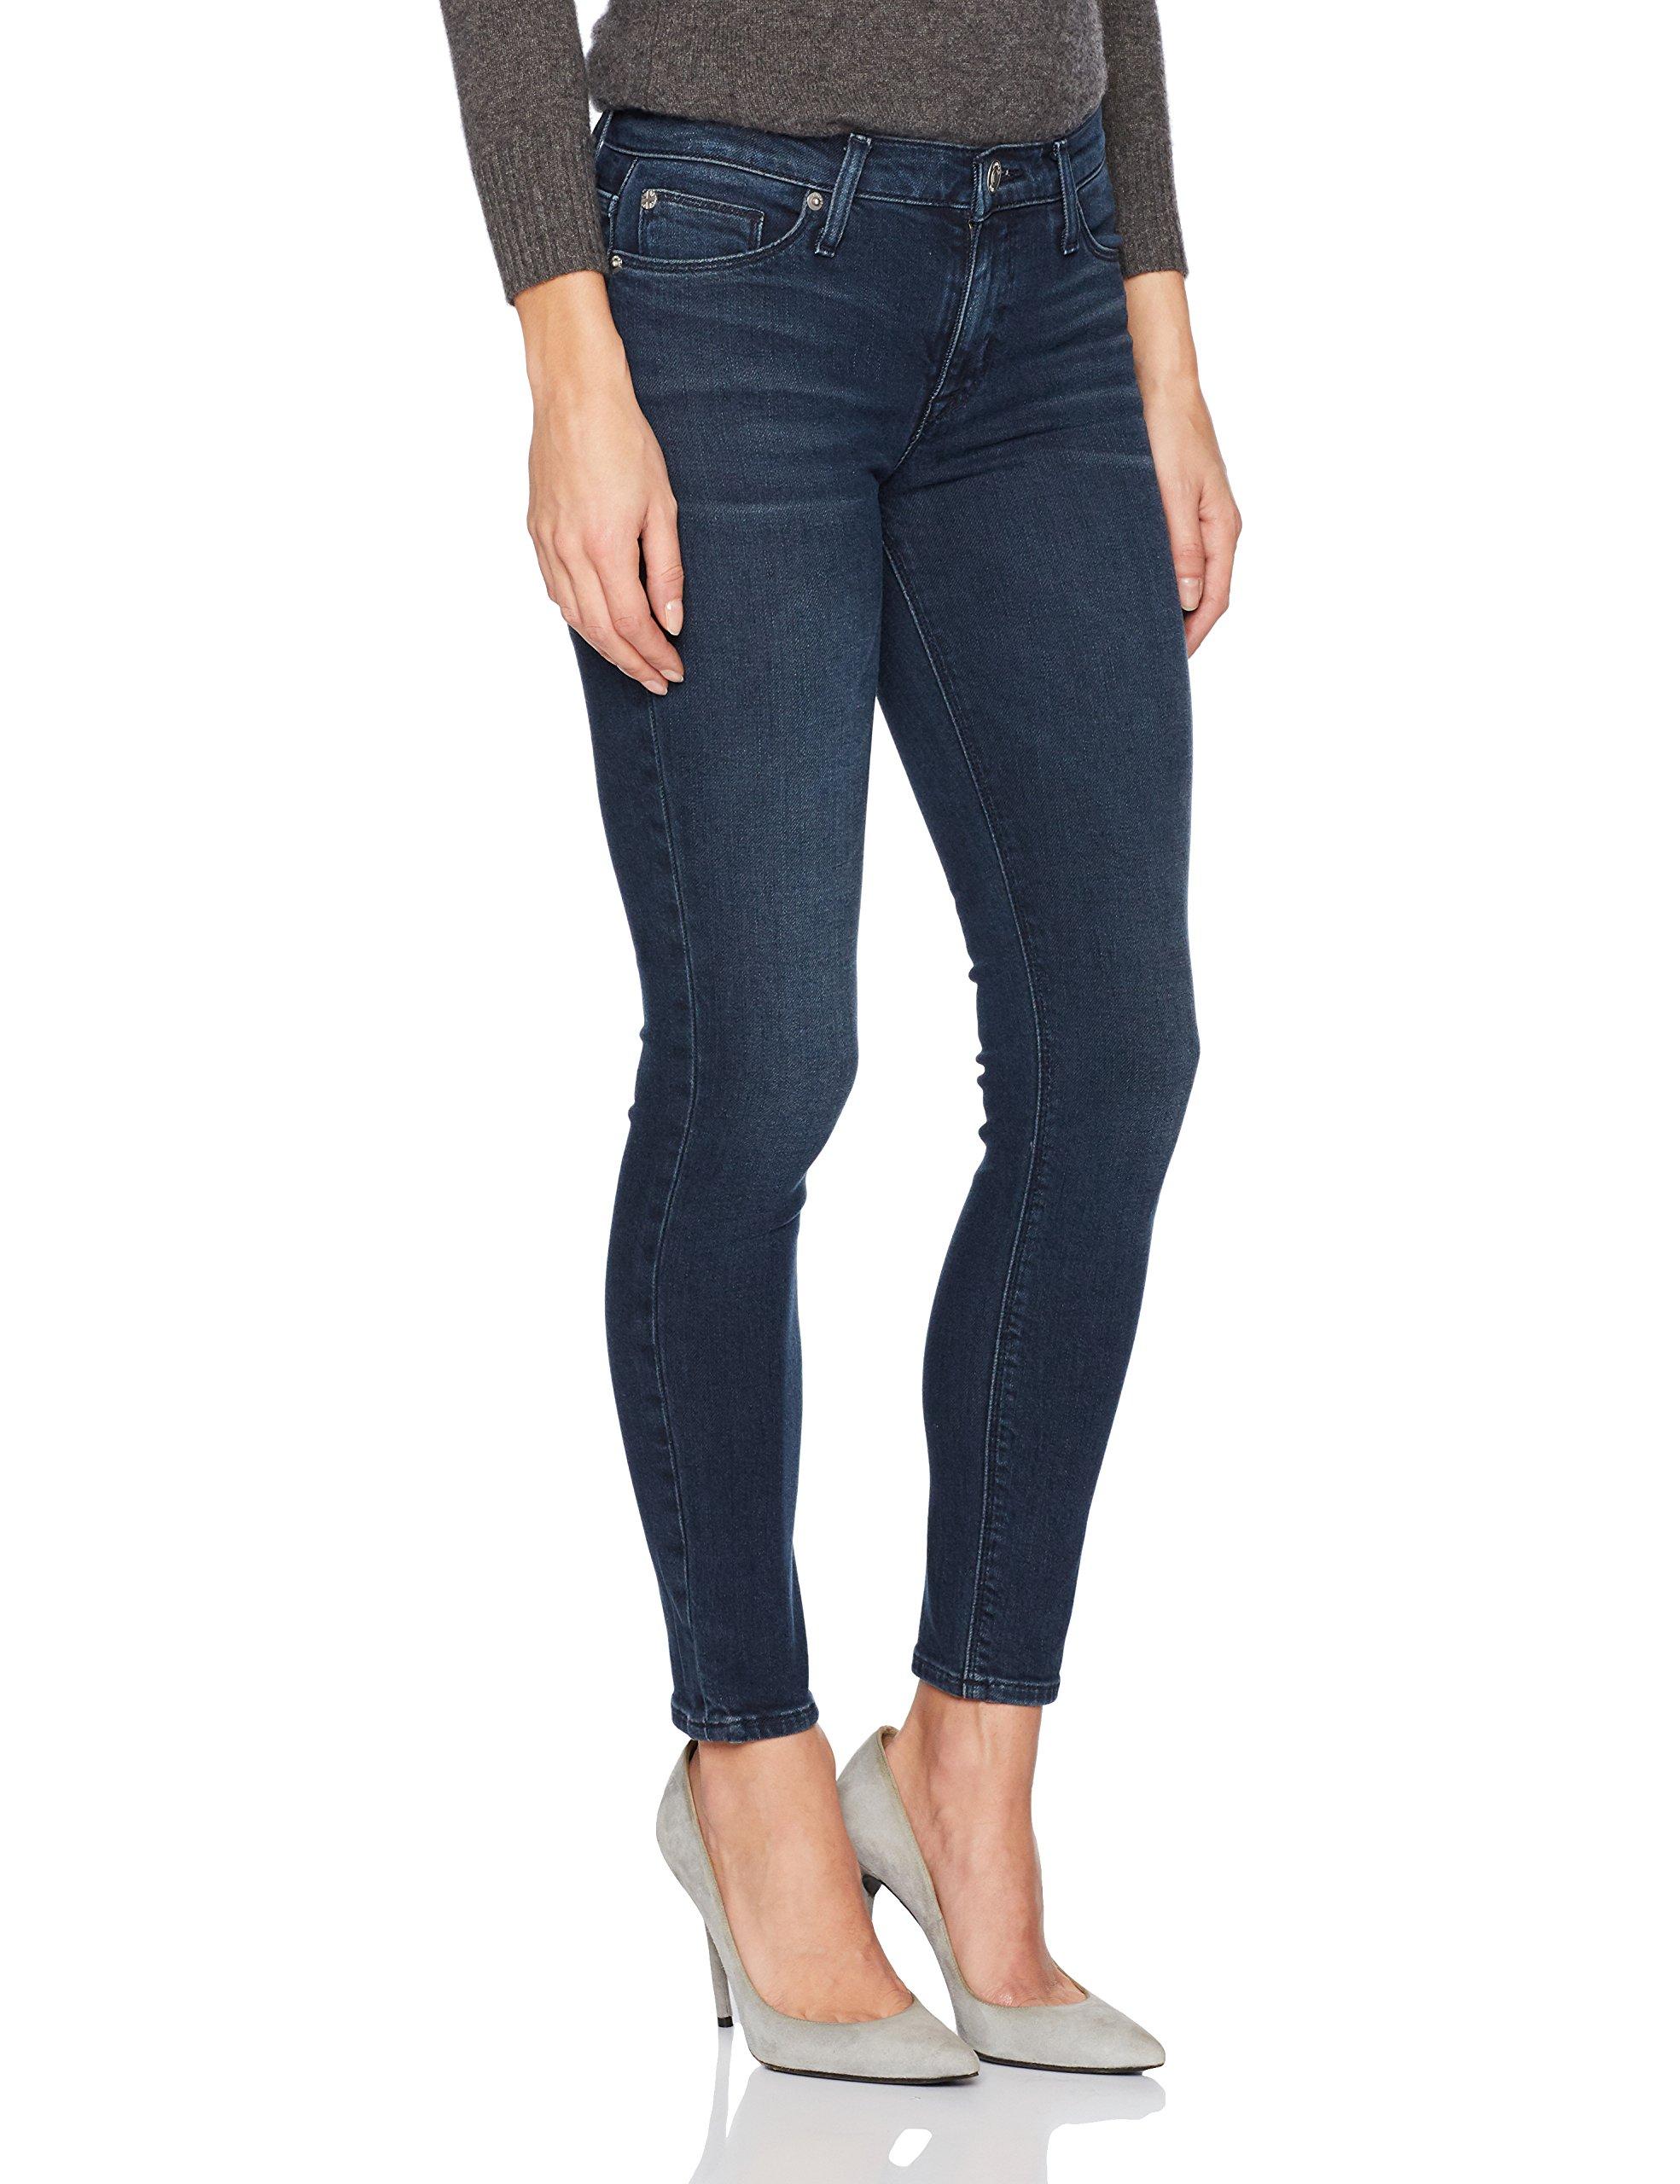 Hudson Jeans Women's Nico Midrise Super Skinny Ankle Jeans, Love Lock, 26